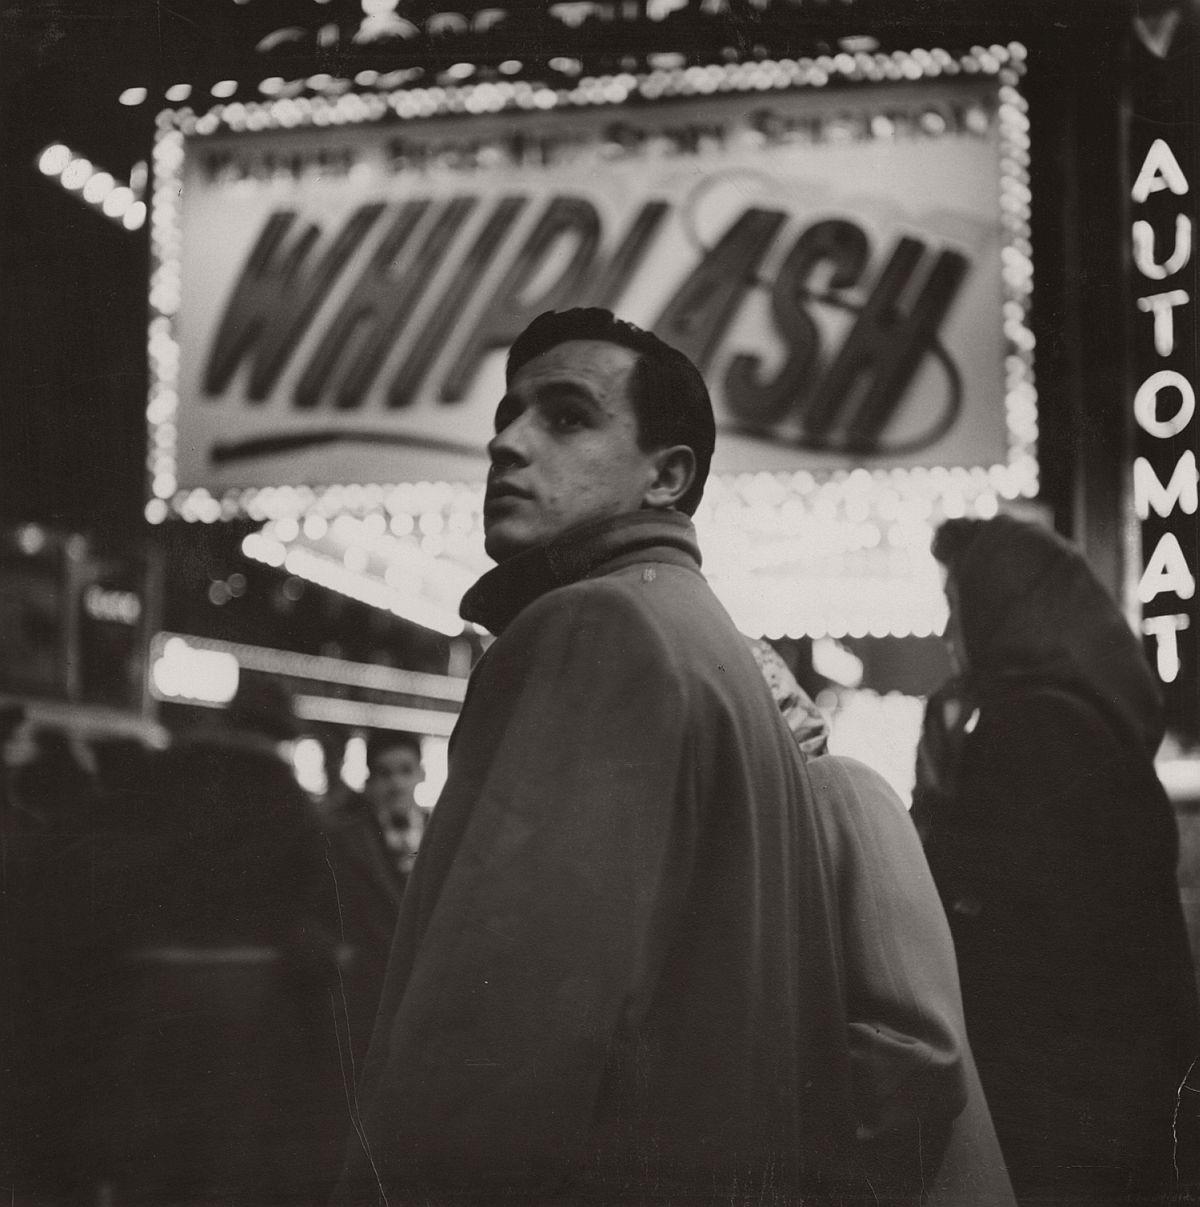 Man on Broadway, 1949